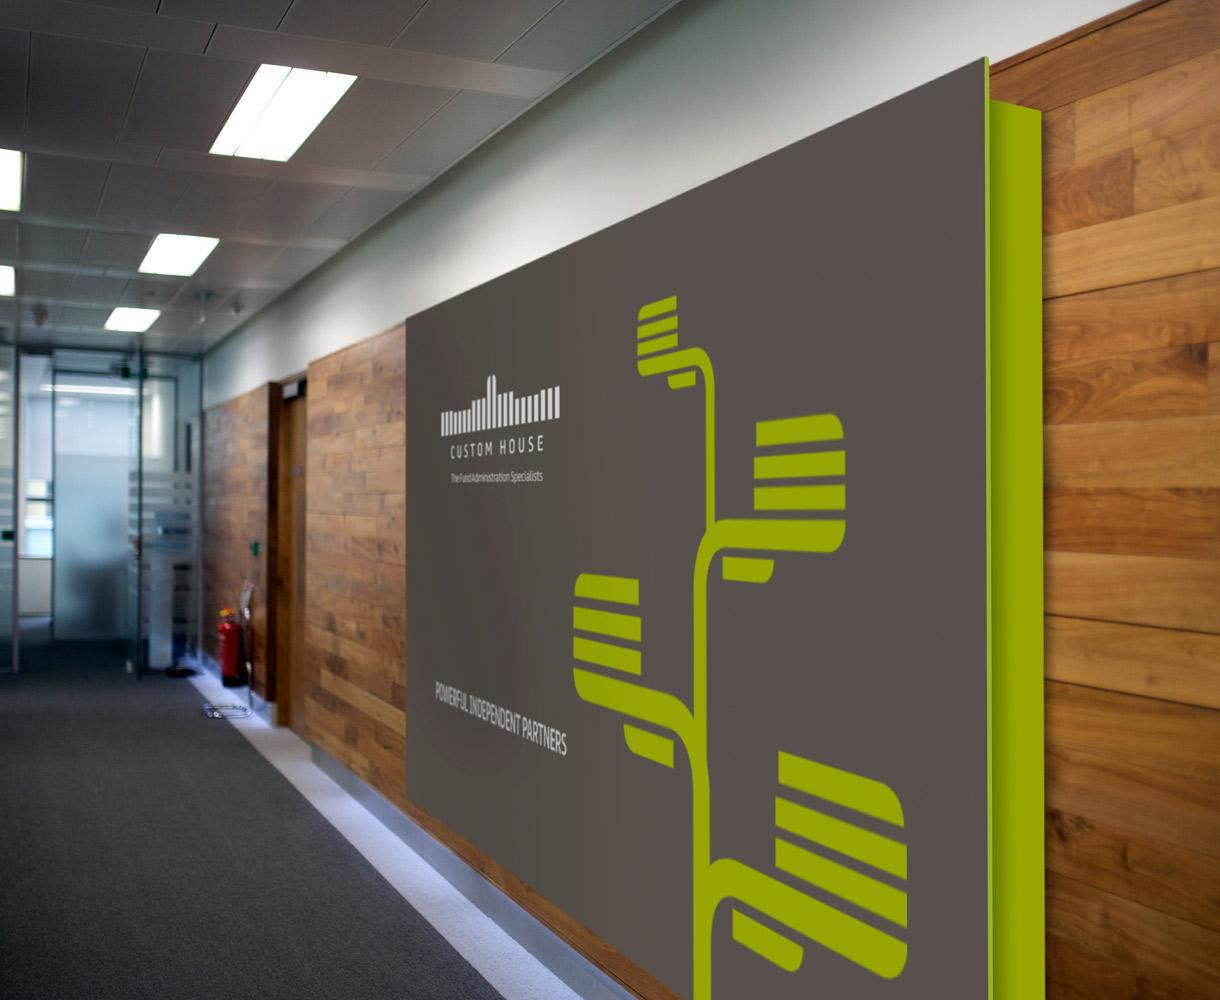 Principle design agency Dublin Custom house group brand project signage on internal wall I